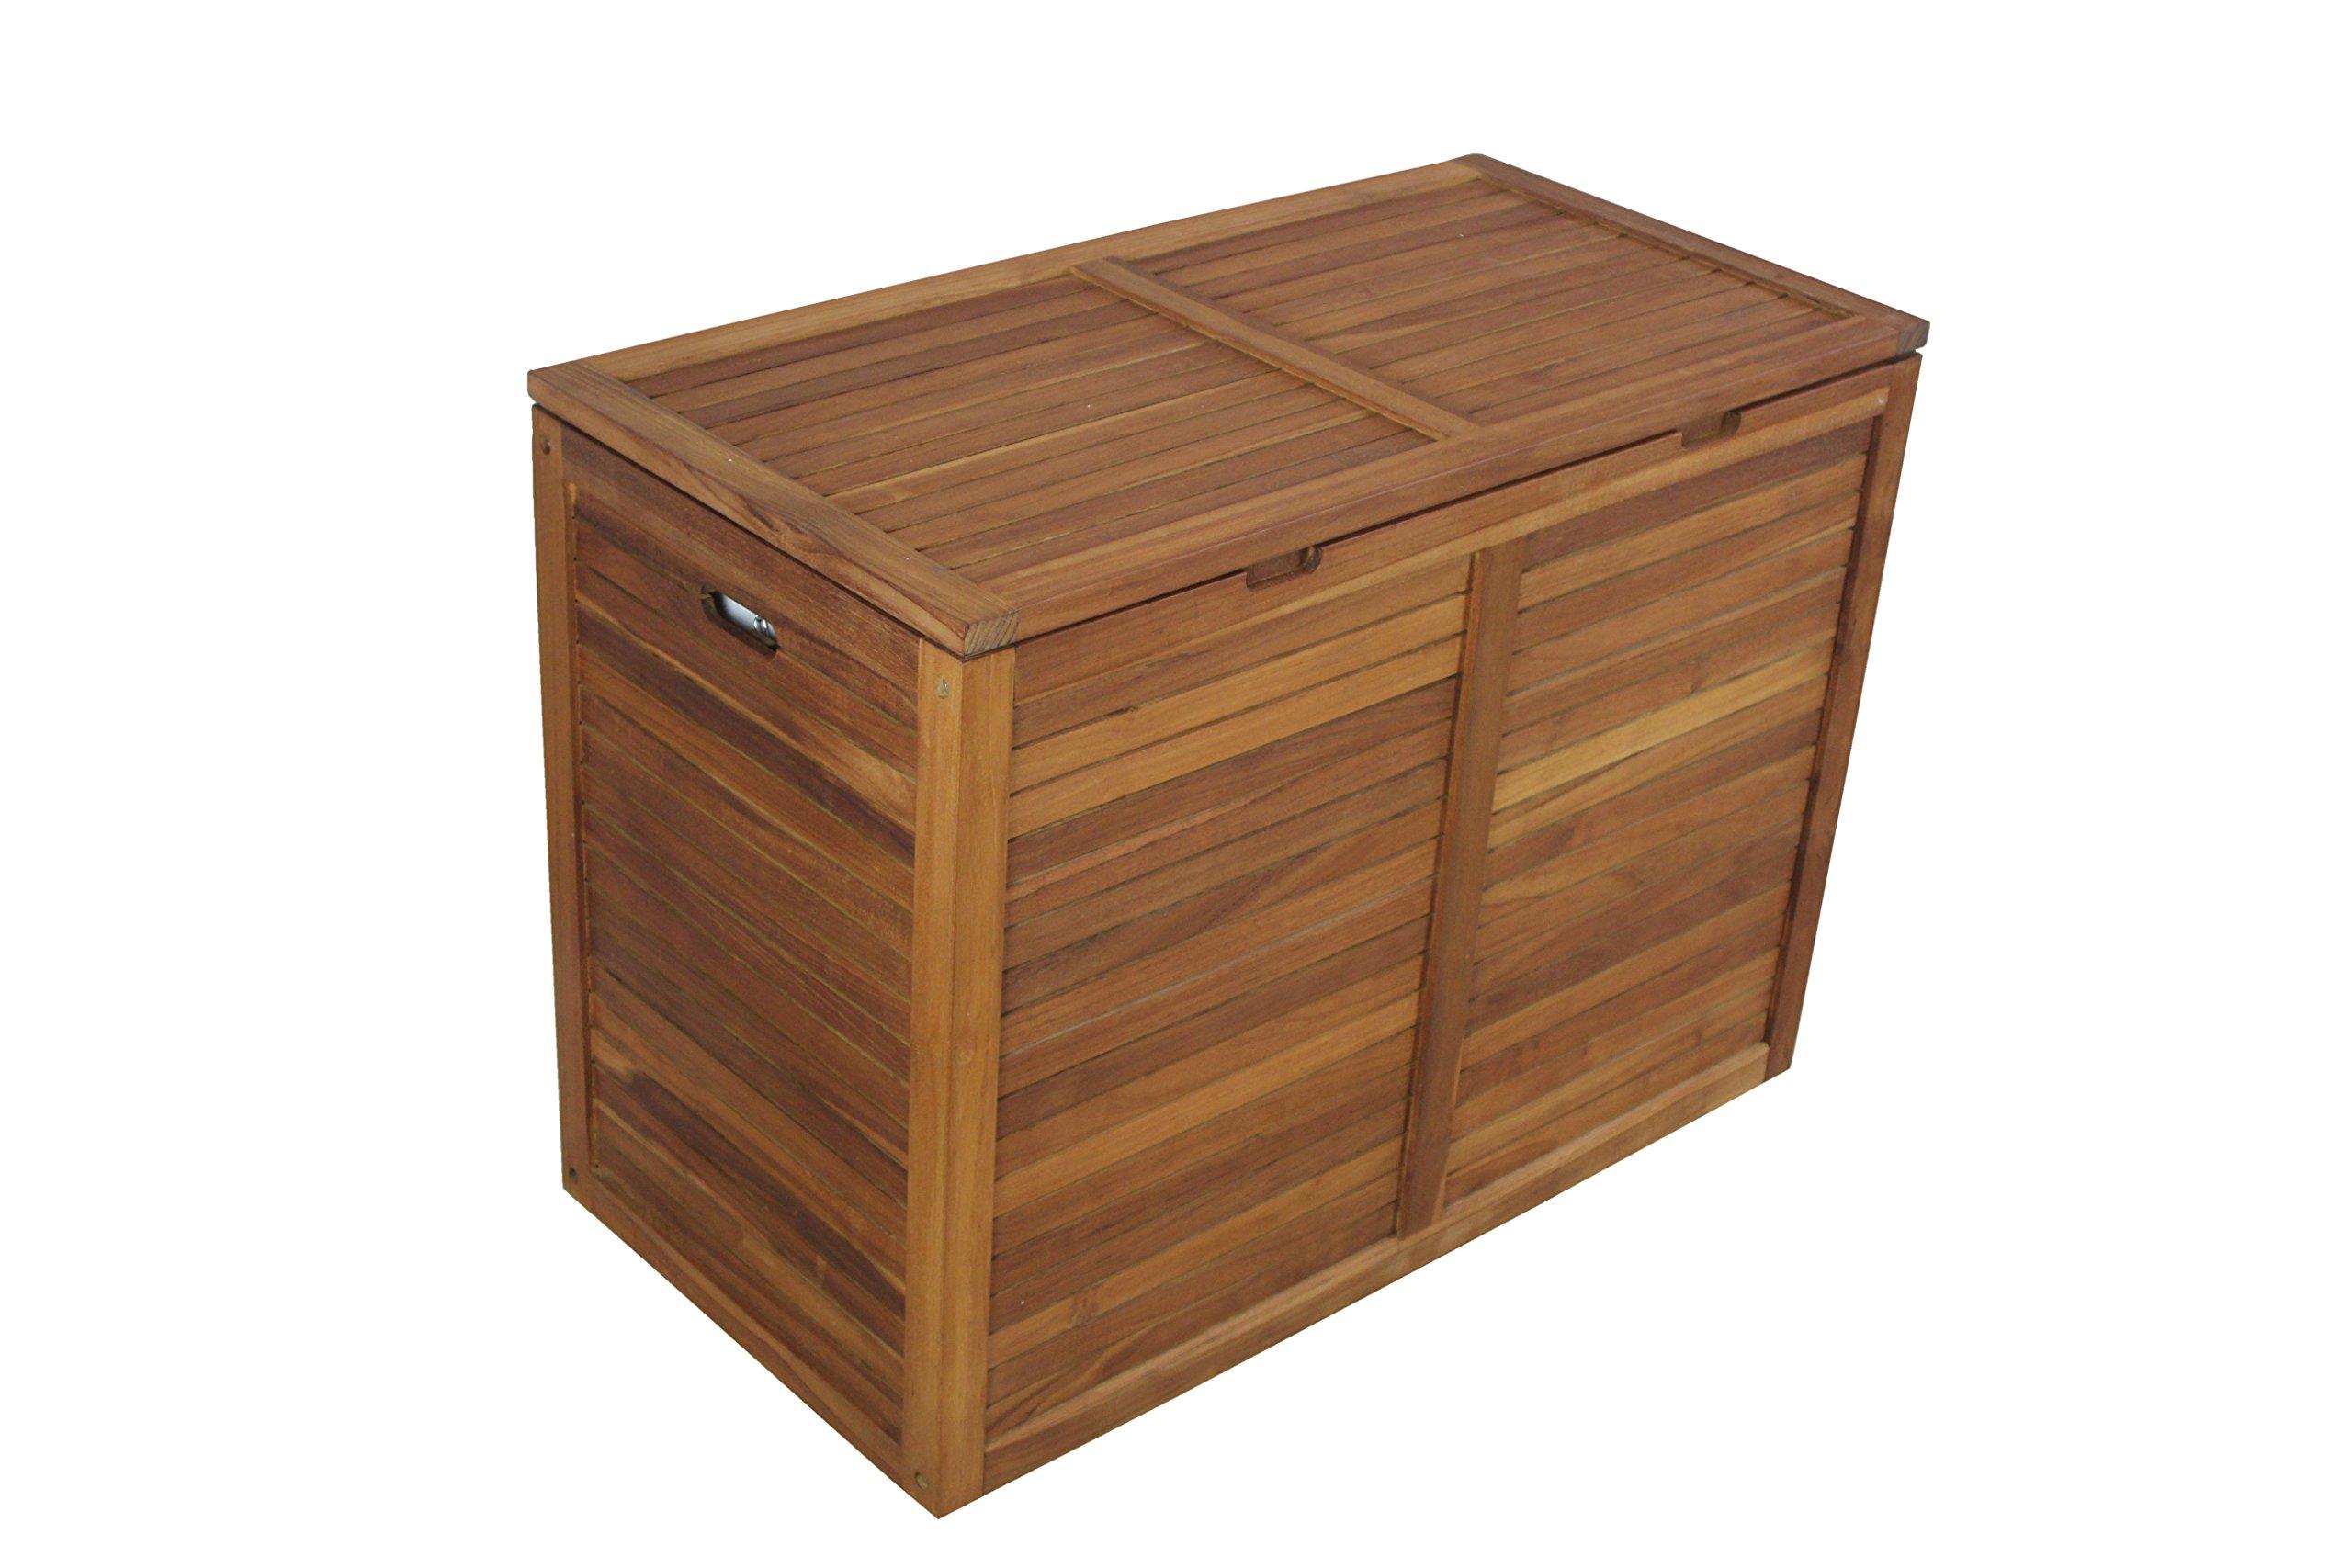 The Original Moa Double Teak Laundry or Storage Hamper